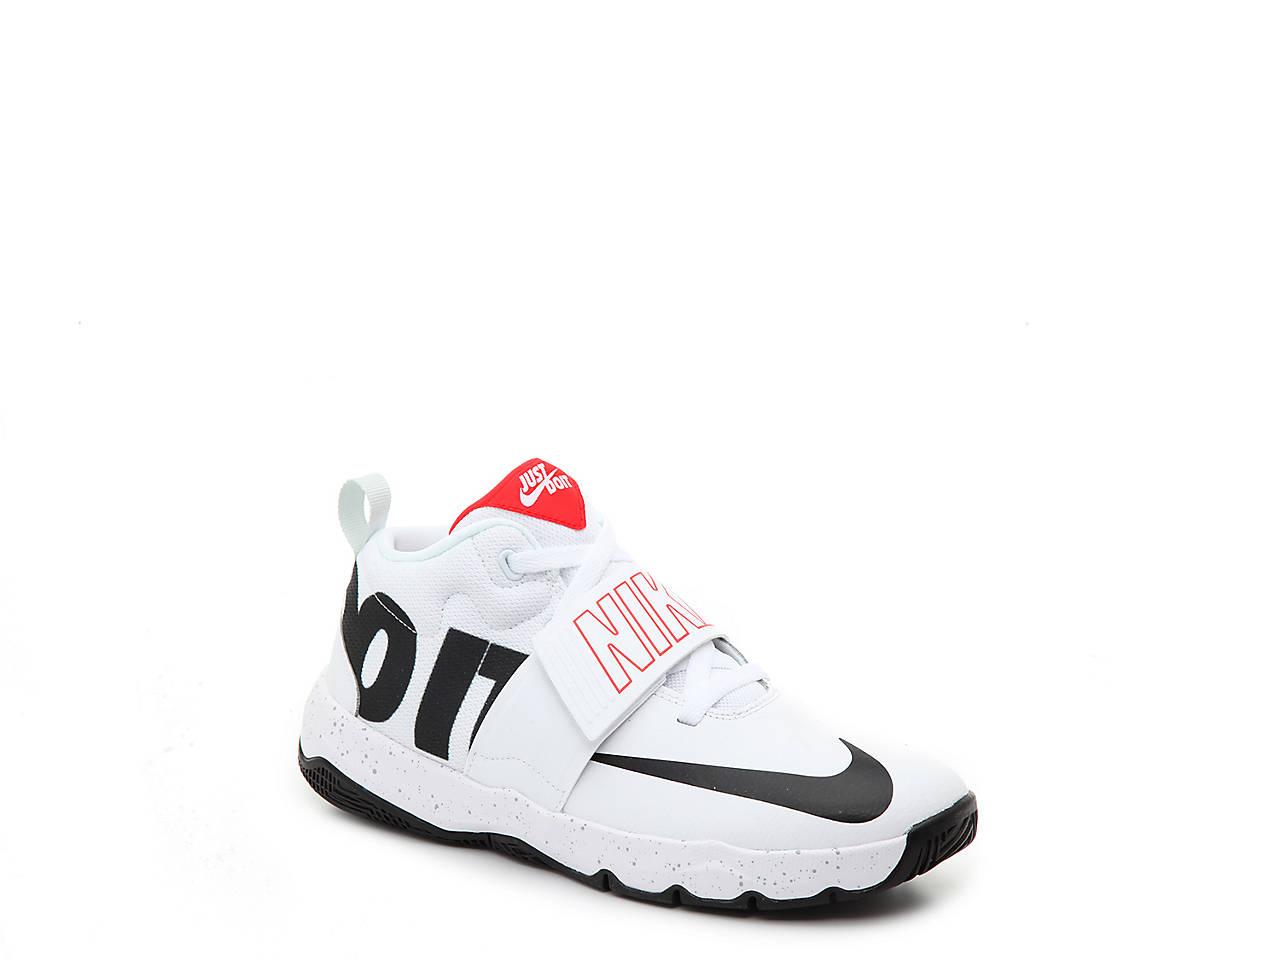 b58d9ea8d00 Nike Team Hustle D8 Toddler   Youth Basketball Shoe Kids Shoes